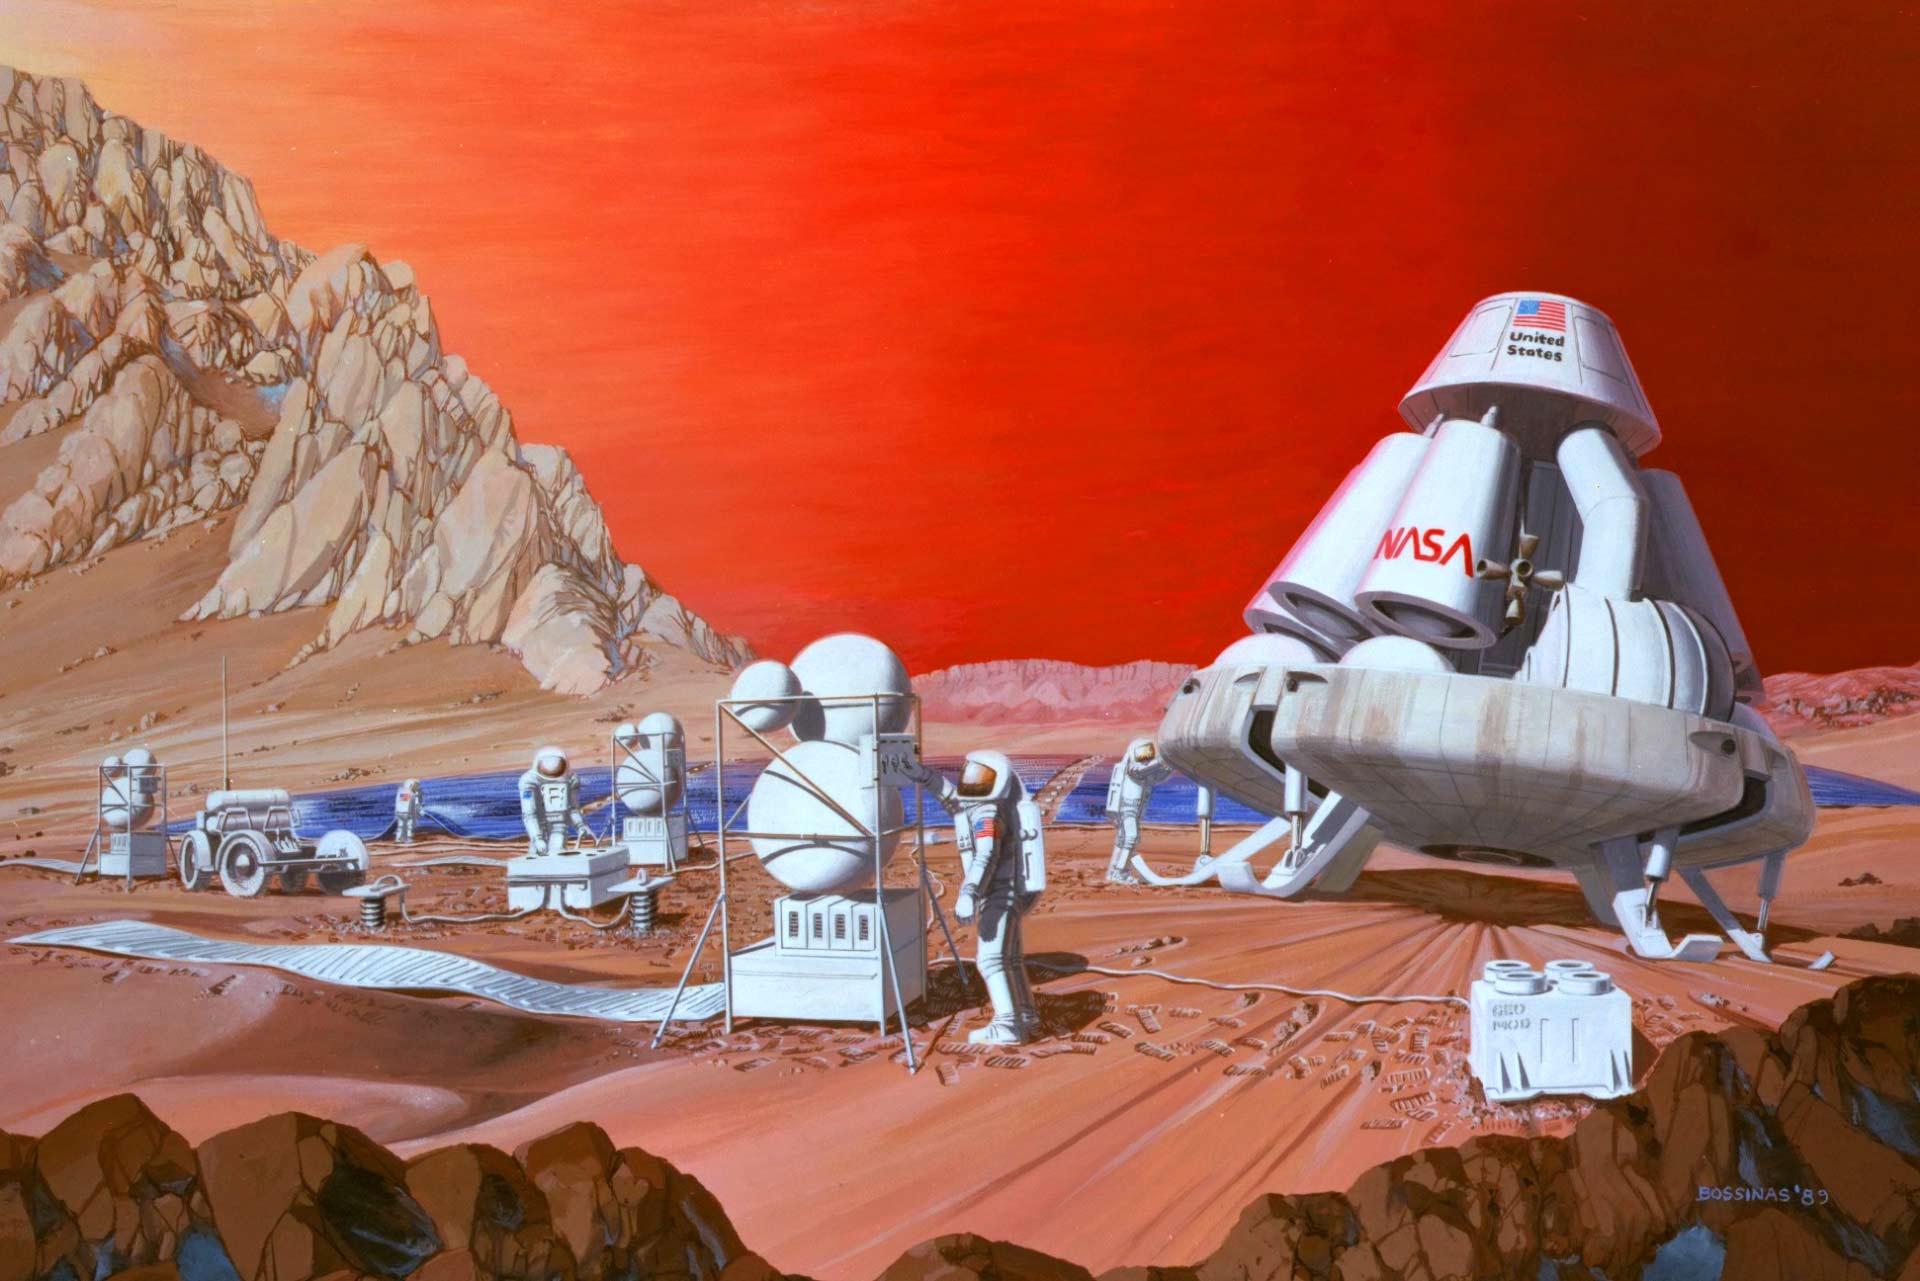 image_2759e-Mars-Mission